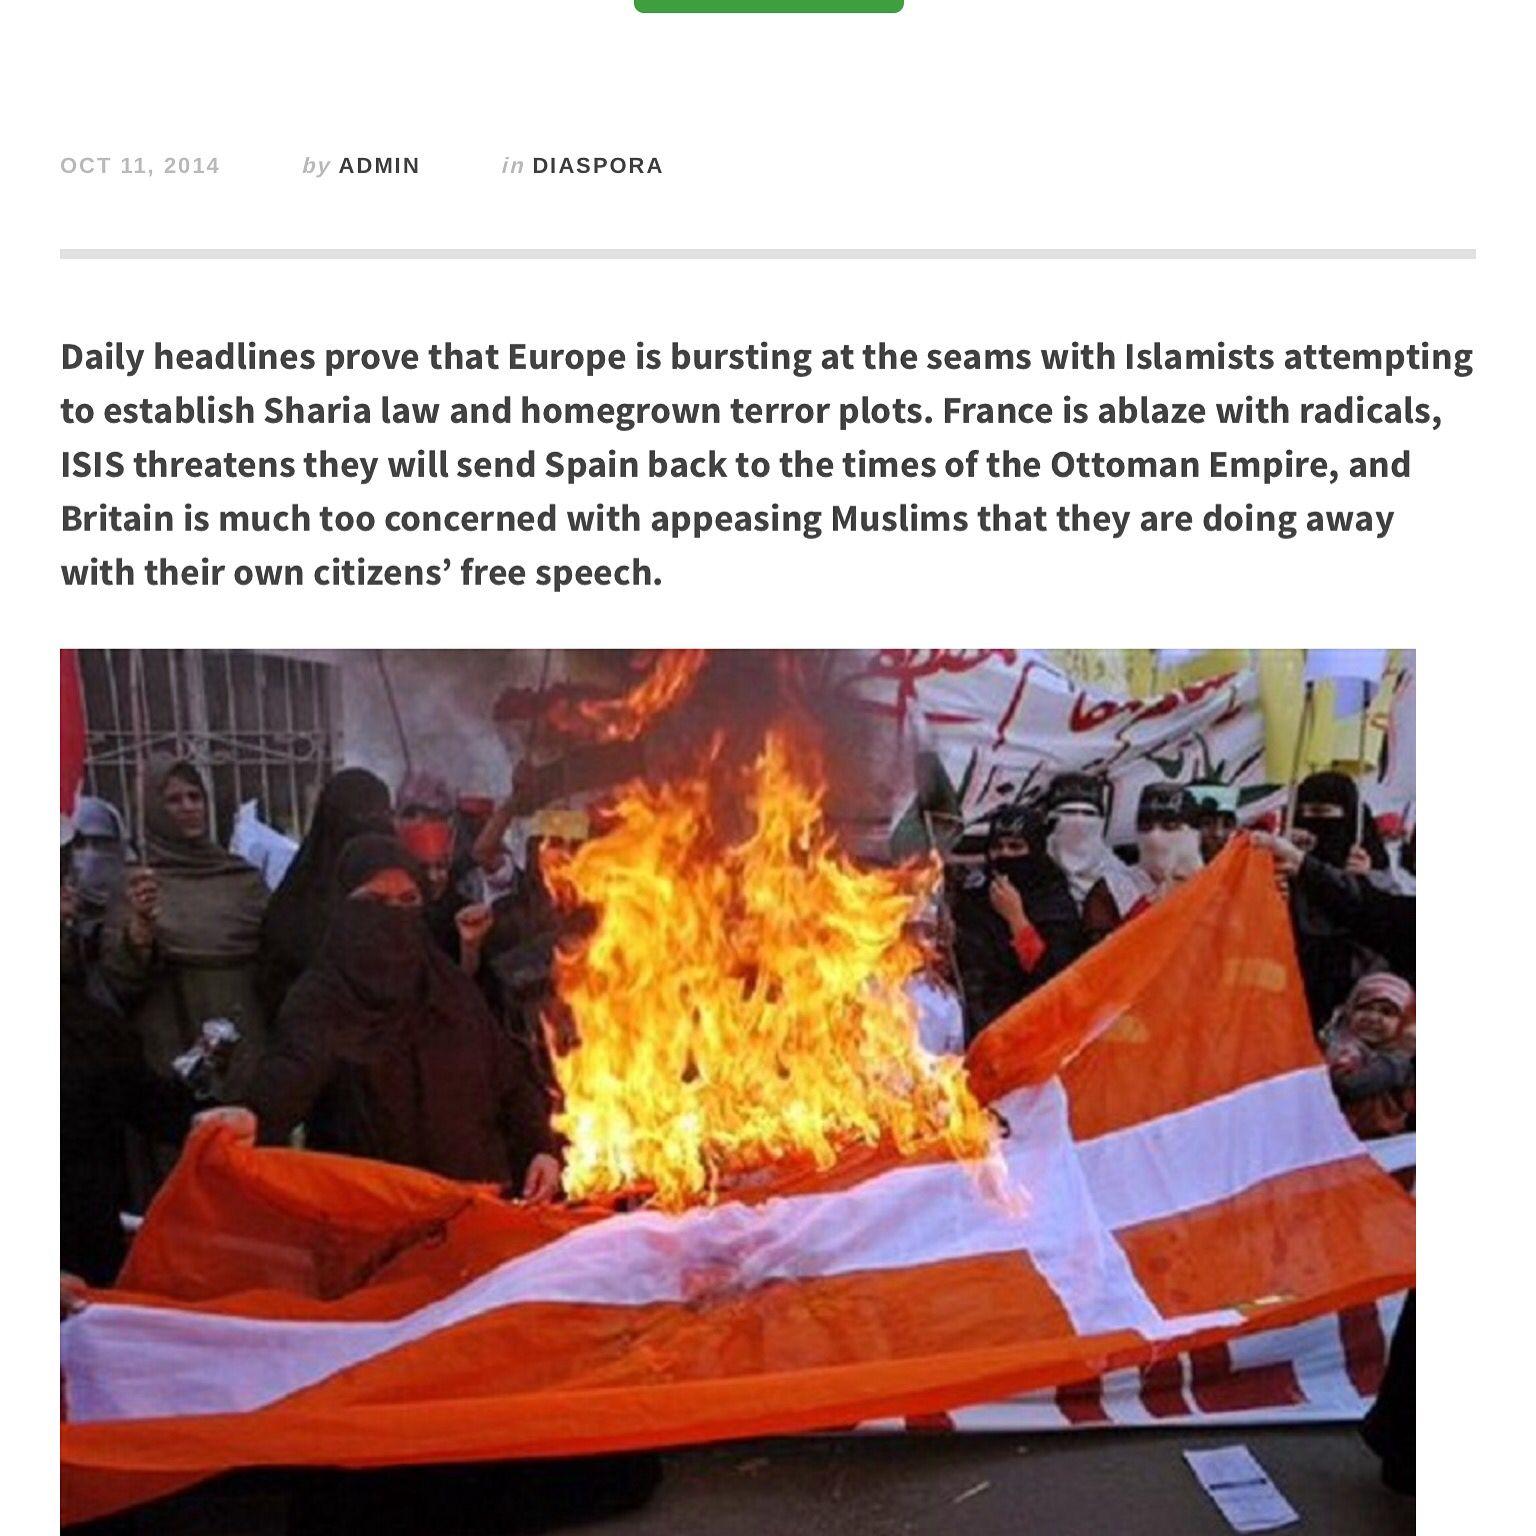 #turkeygate #muslimernebagsløret